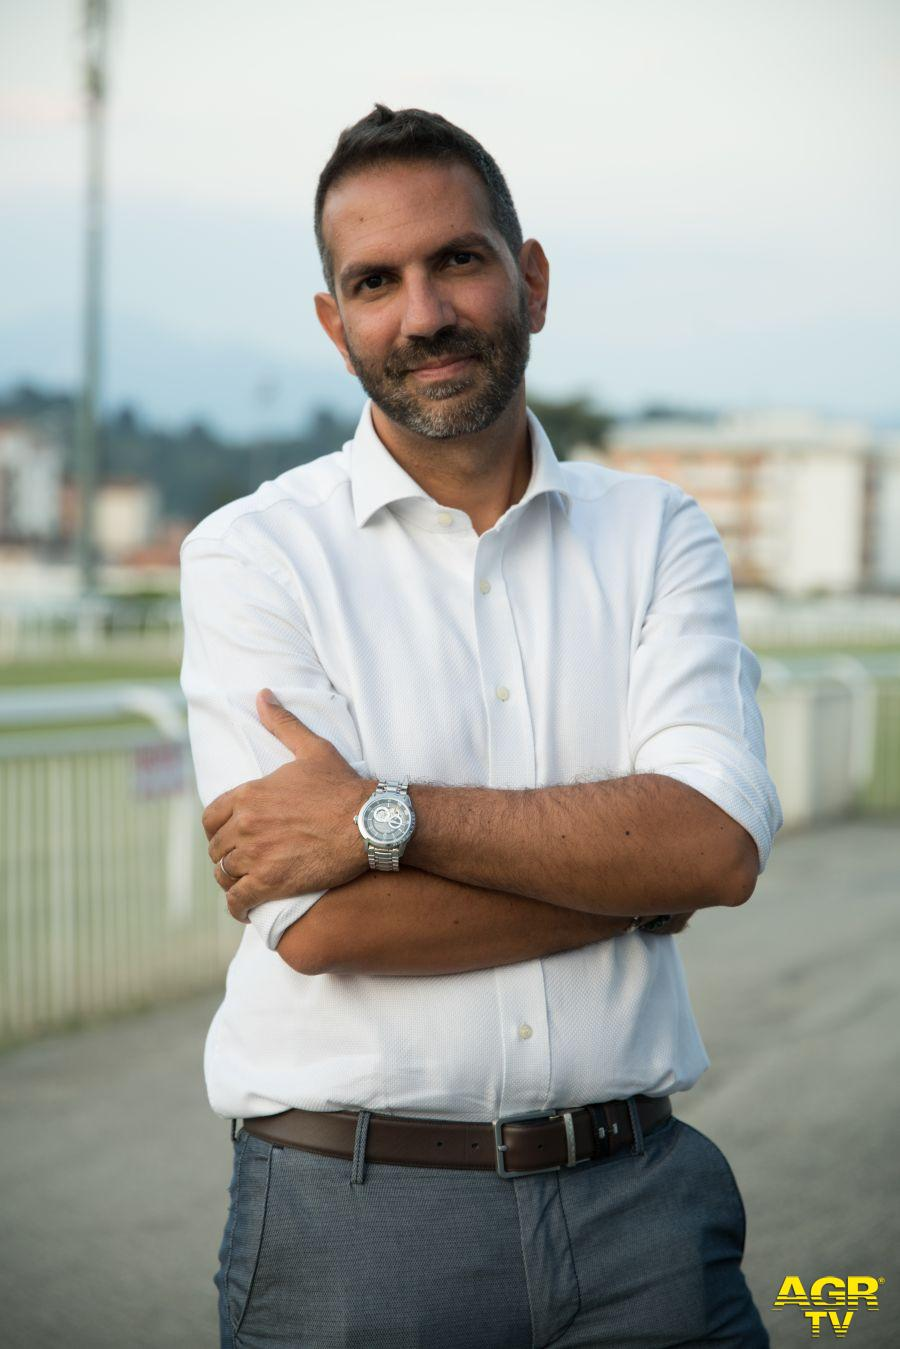 Dott. Leonardo Mendolicchio